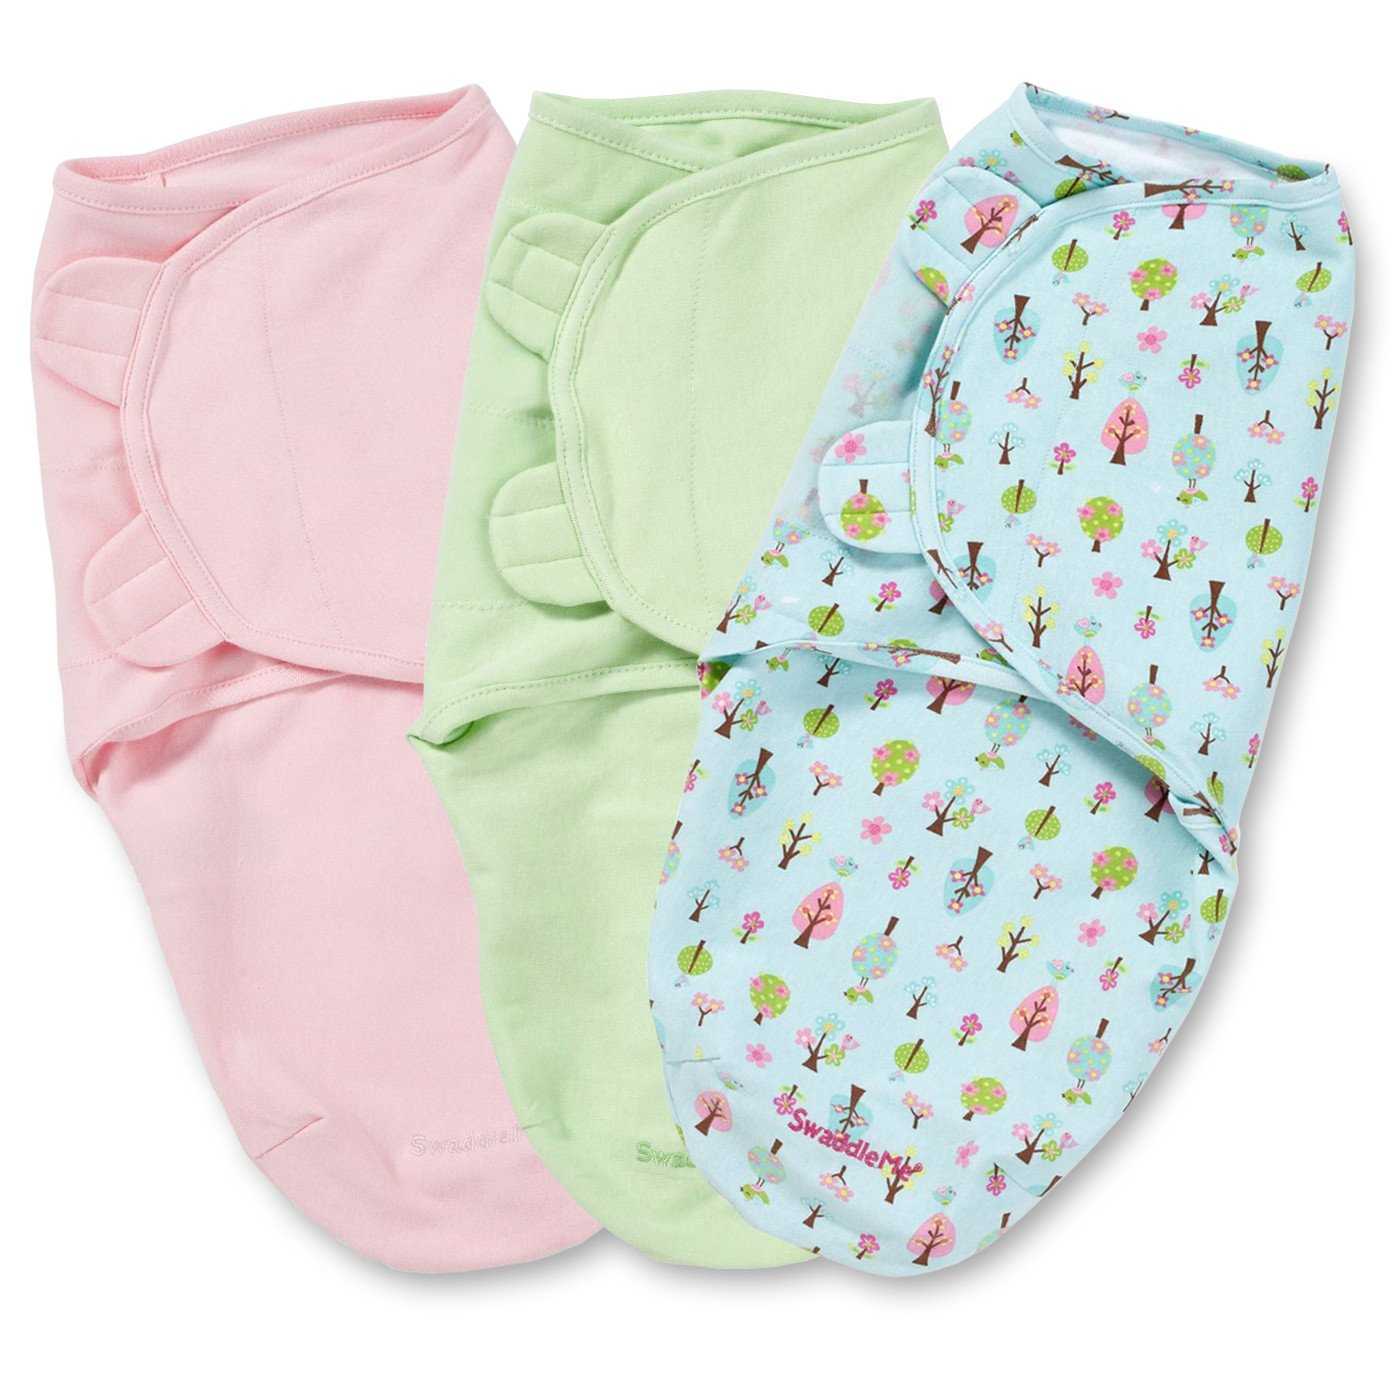 The Original Swaddle Me Adjustable Infant Wrap 2 Pk Girl Small// Medium